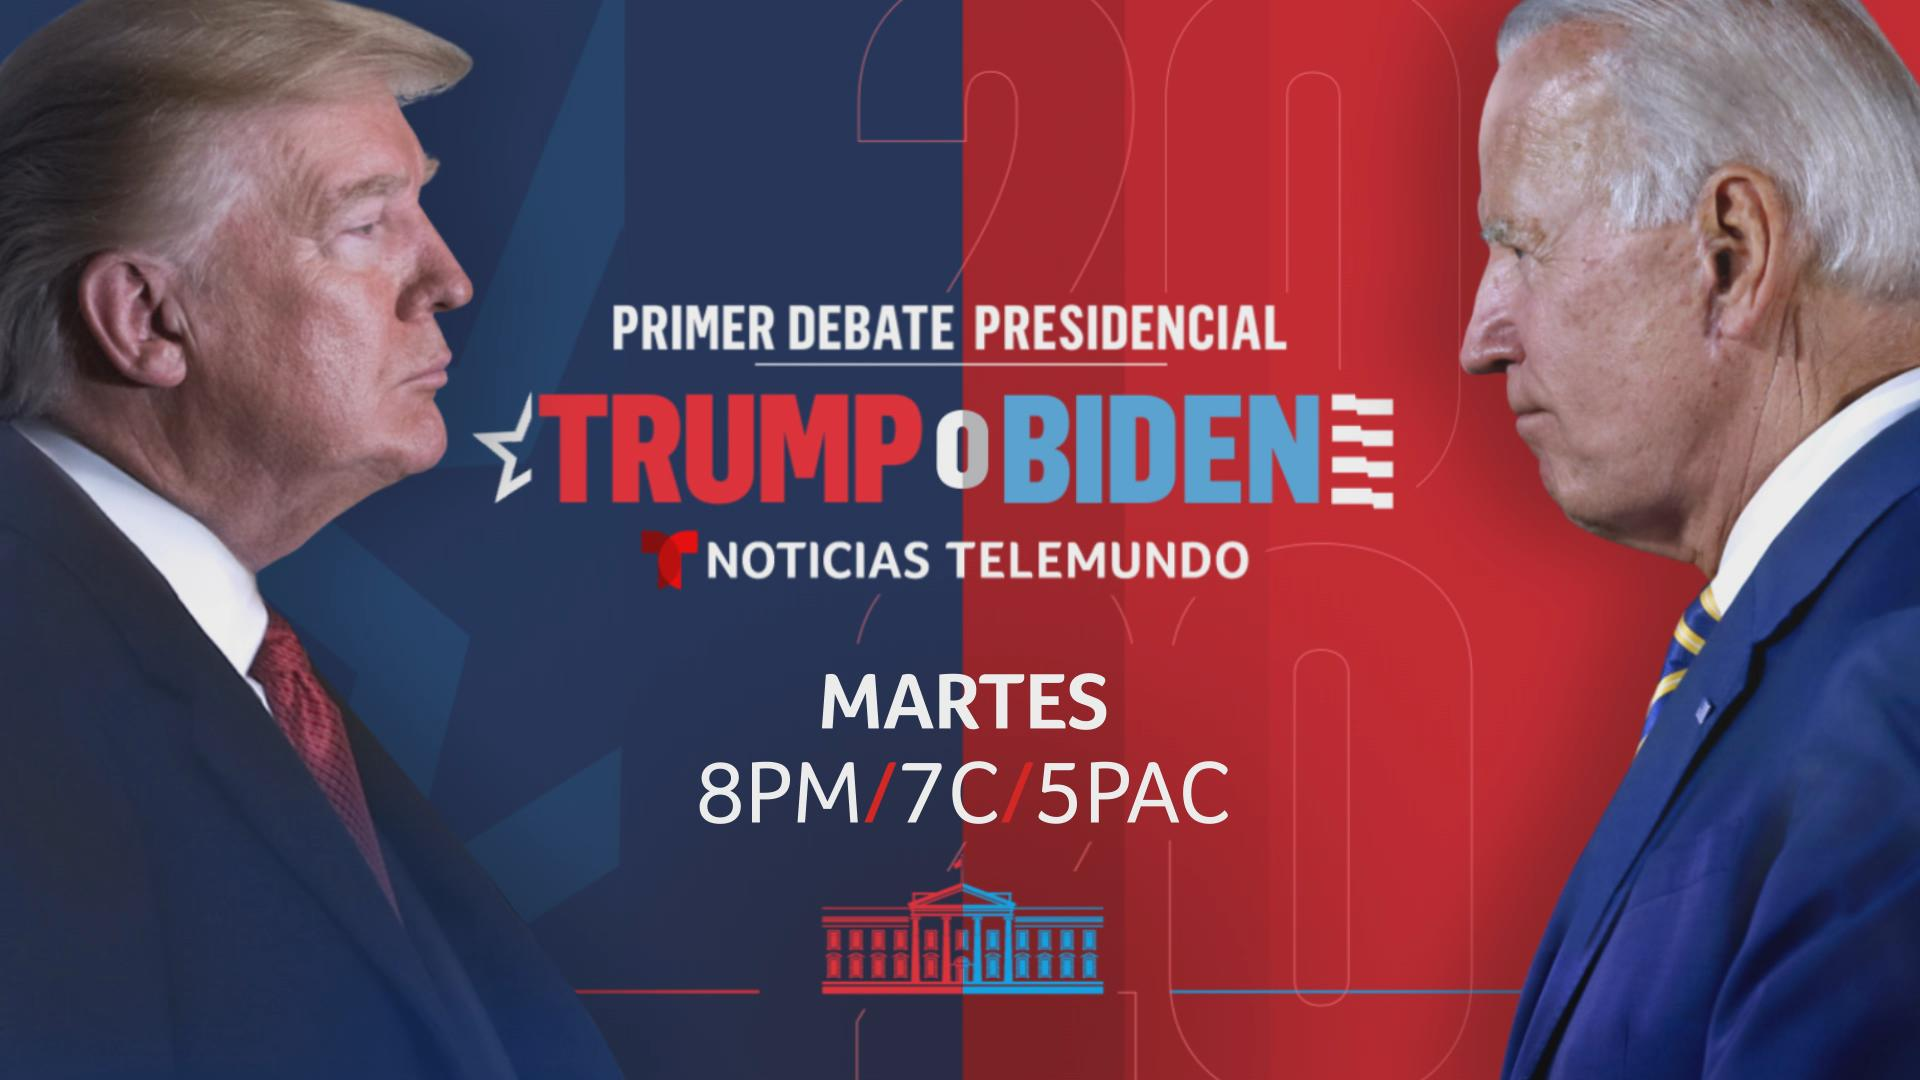 Telemundo Announces Multiplatform Coverage Of The First Presidential Debate